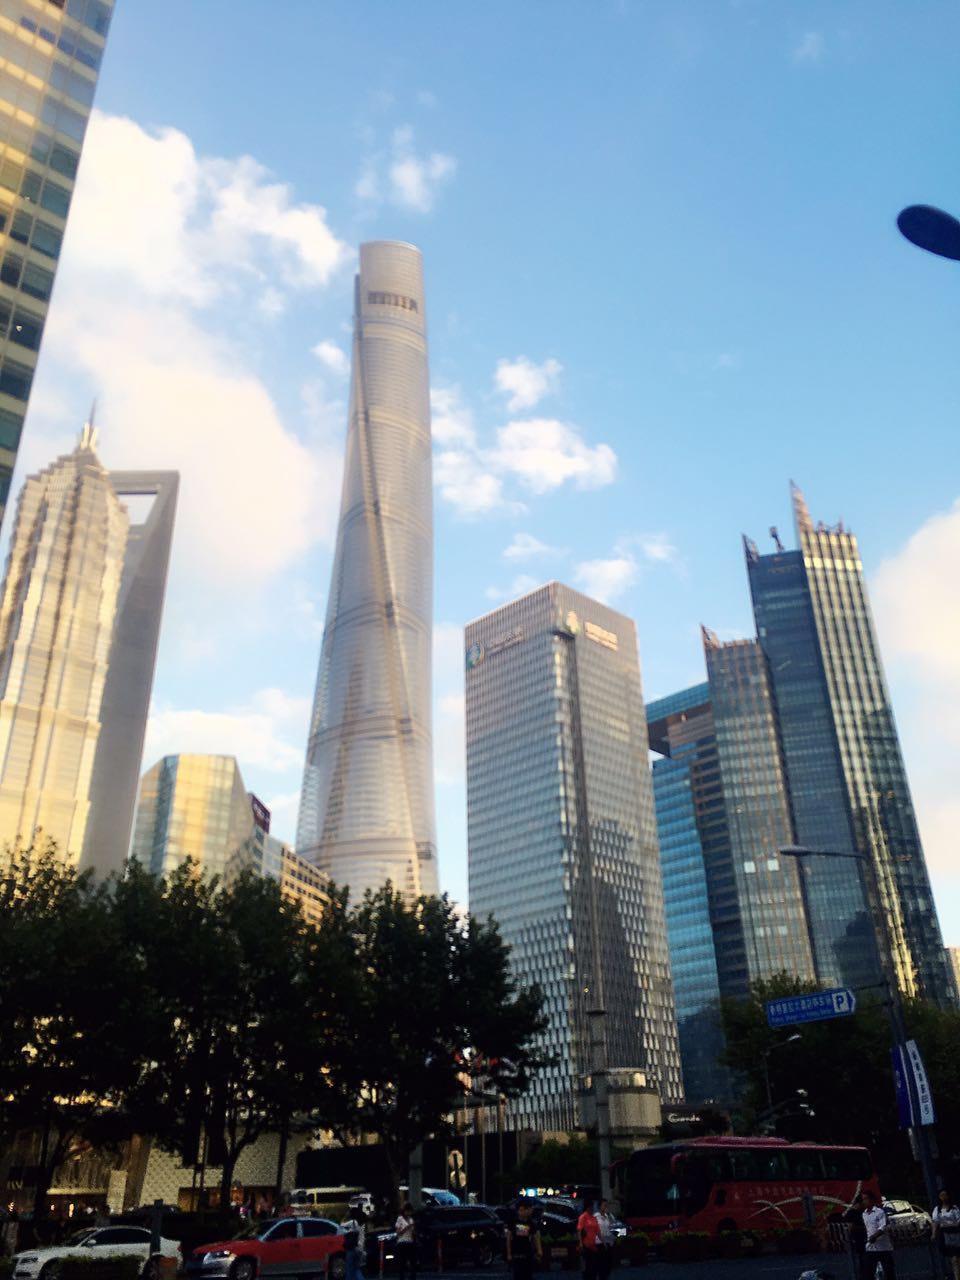 CAPAStudyAbroad_Shanghai_Spring2017 - Asia Rising - The Shanghai Tower by Colin Speakman.jpeg